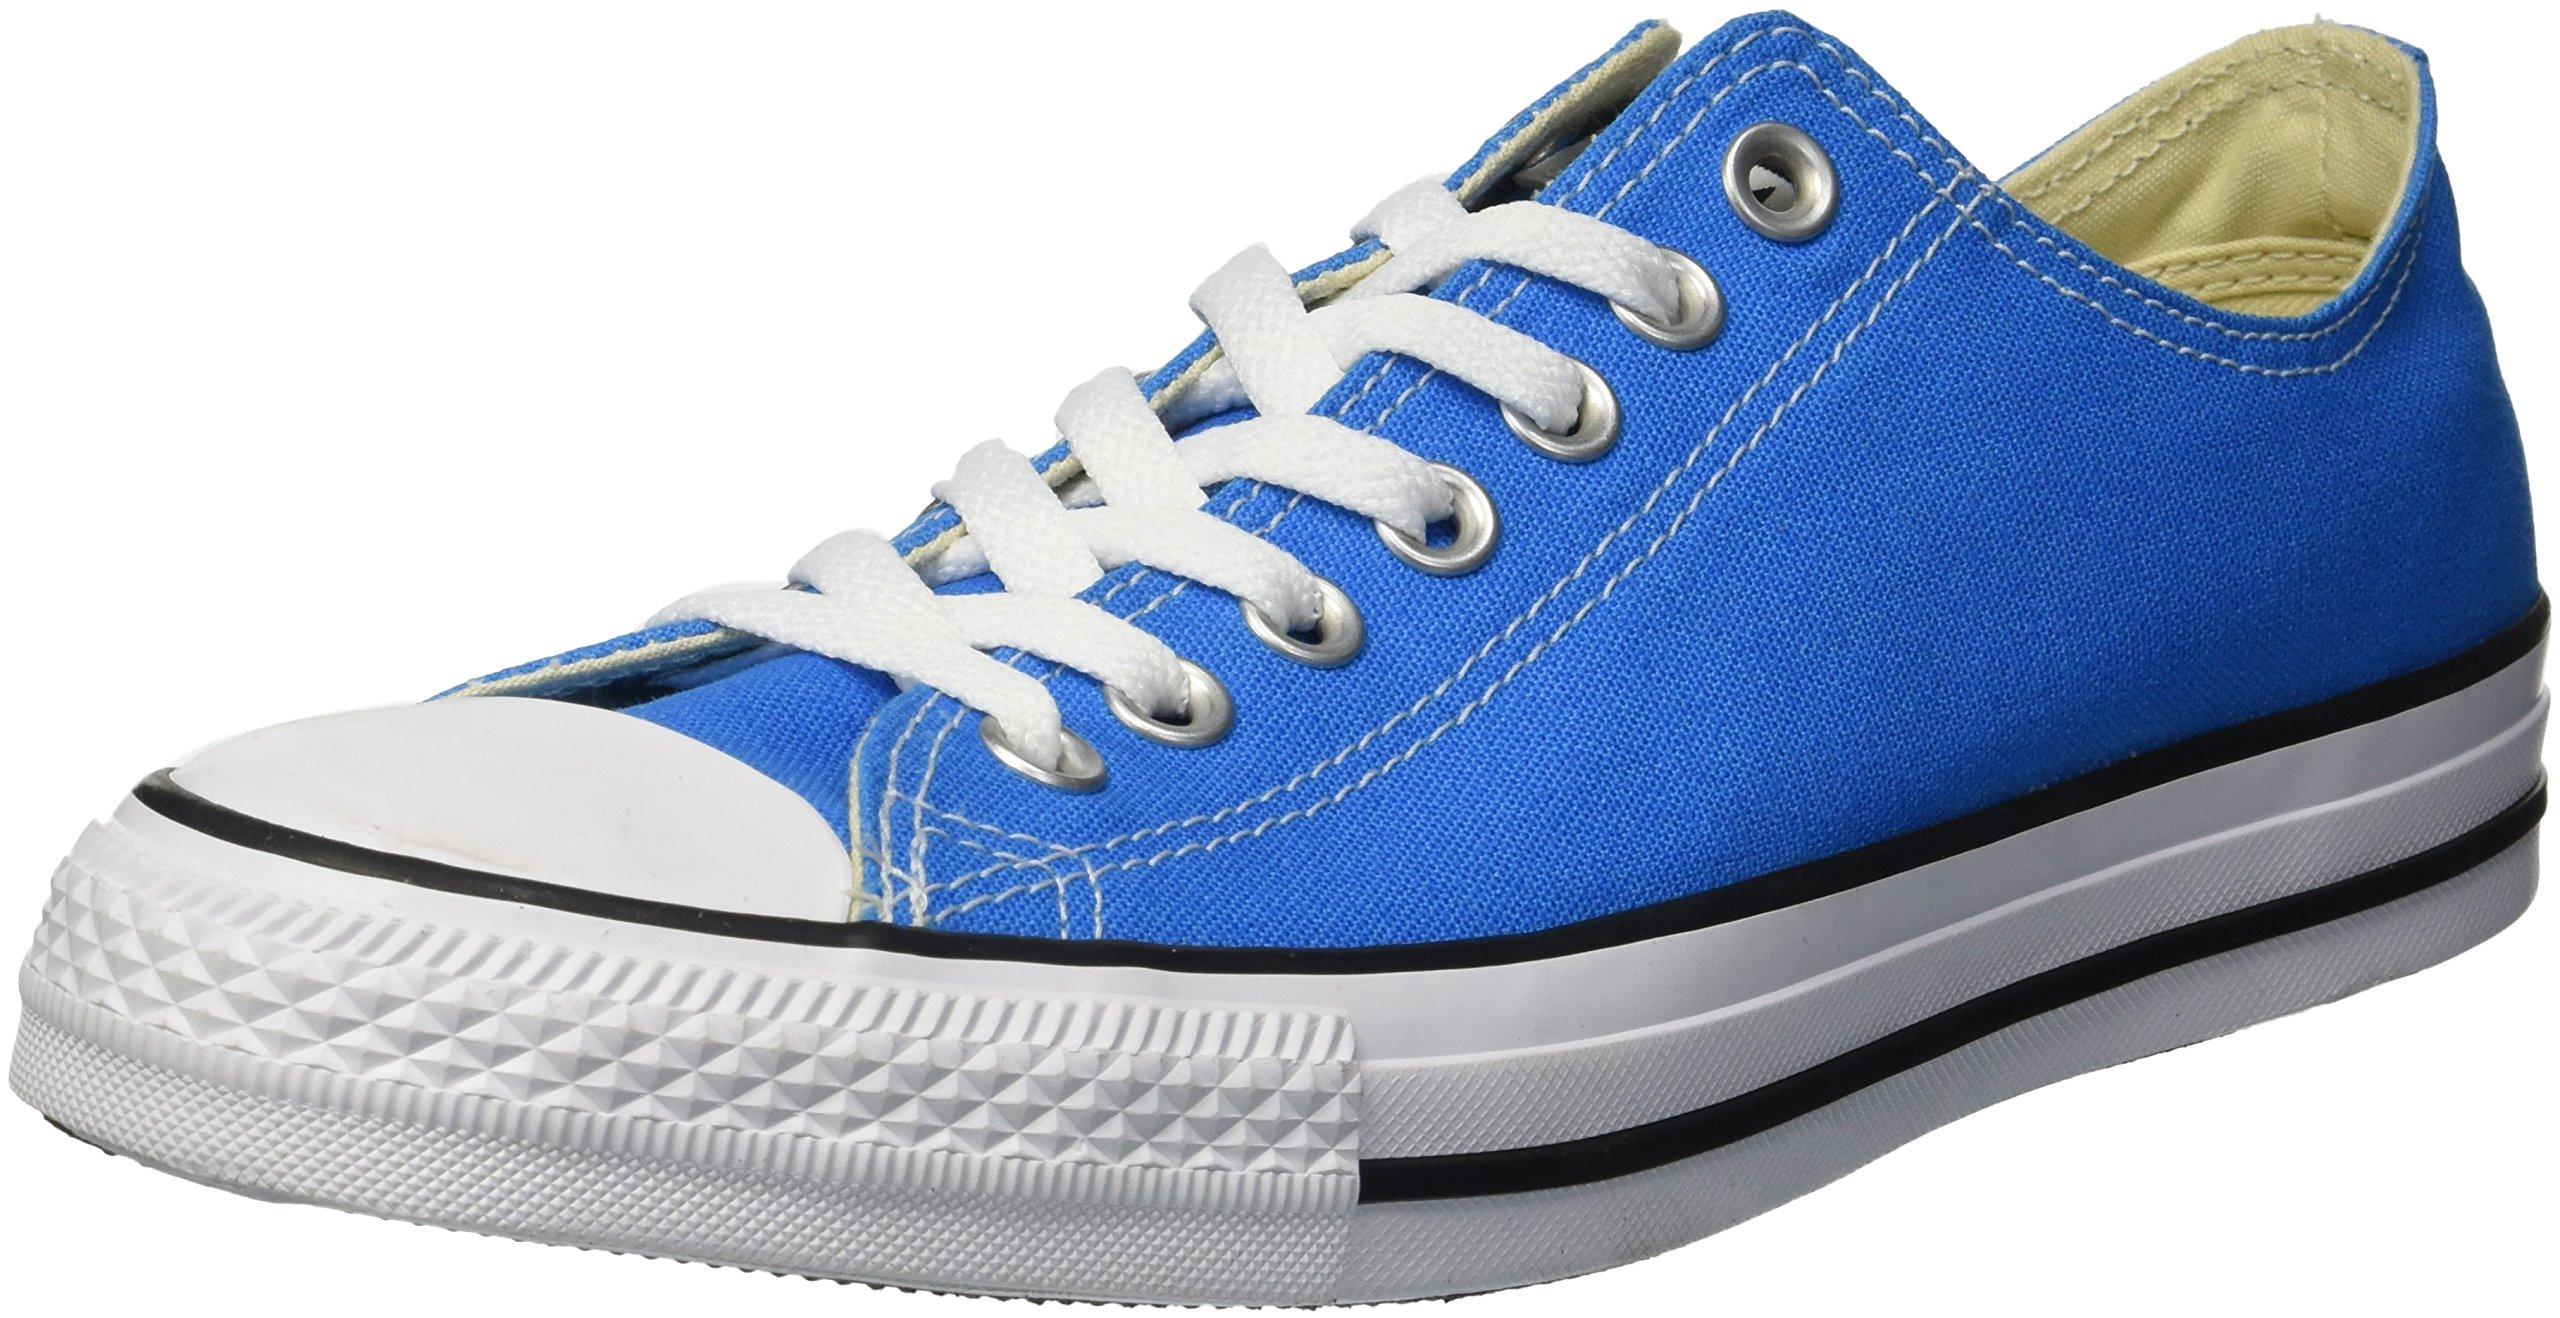 Converse Chuck Taylor All Star 2018 Seasonal Low Top Sneaker, Blue Hero, 5.5 M US